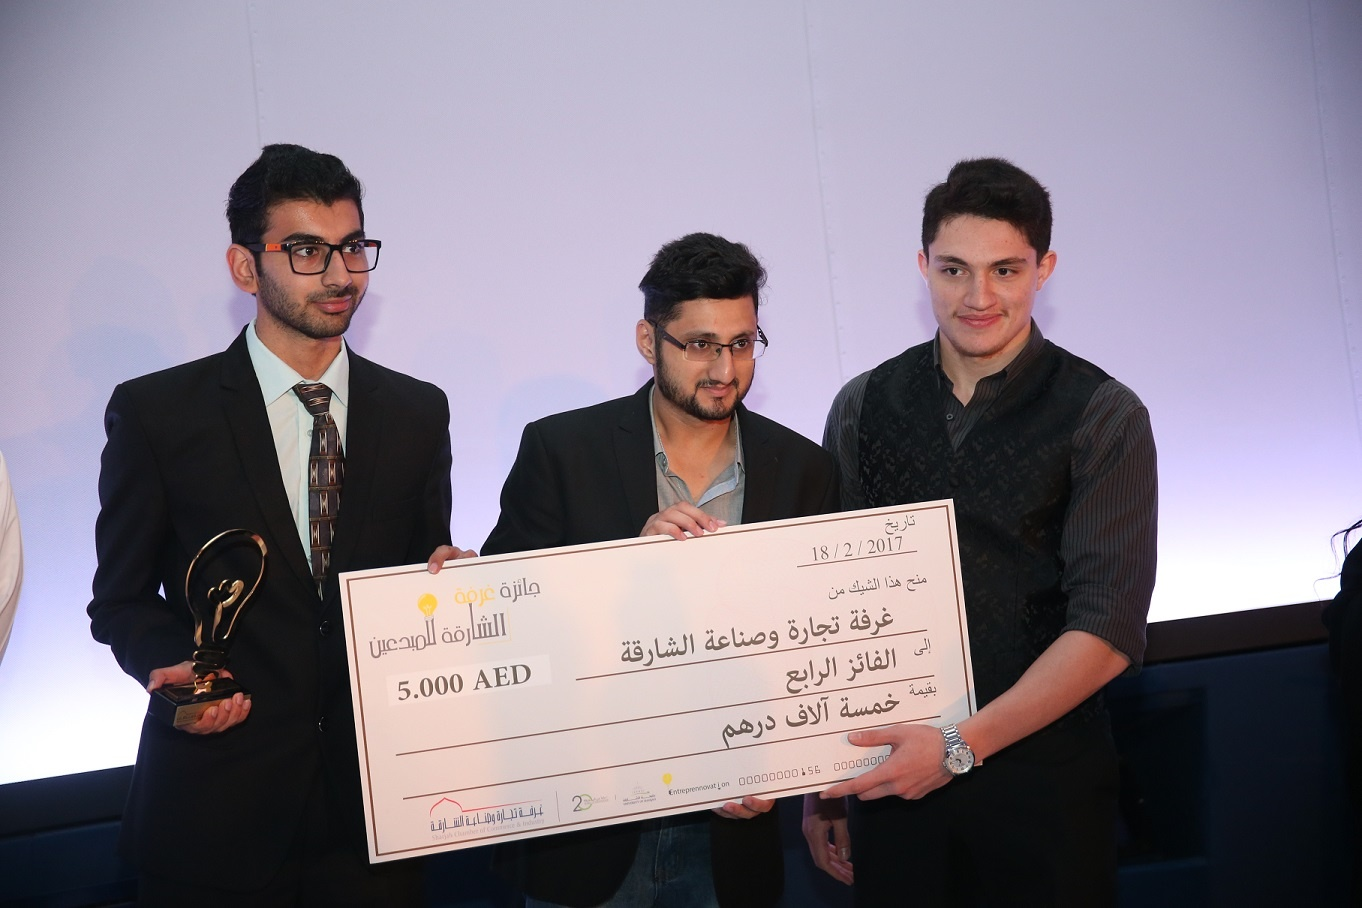 American University of Sharjah Third International Forum on Innovation and Entrepreneurship (1)-2.jpg